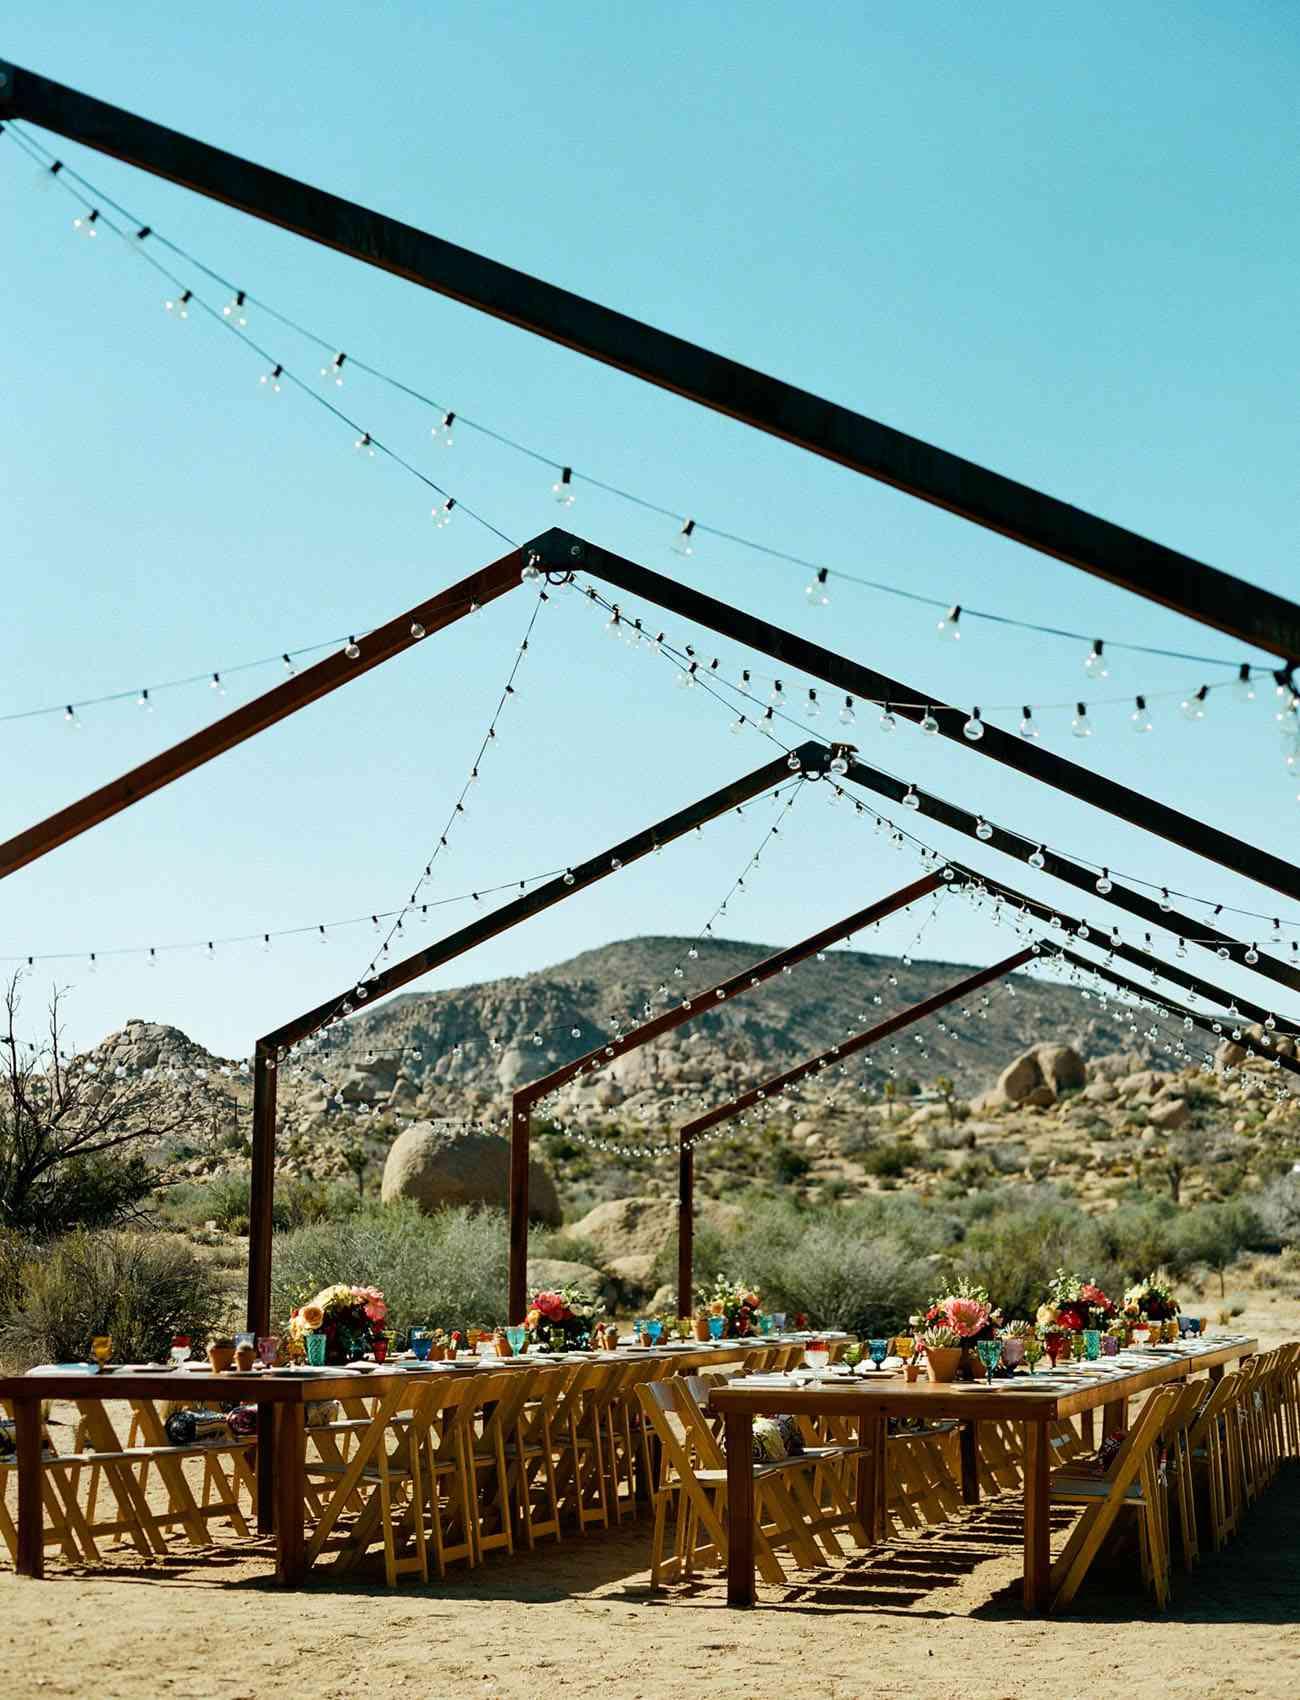 Outdoor Wedding Reception in a Desert